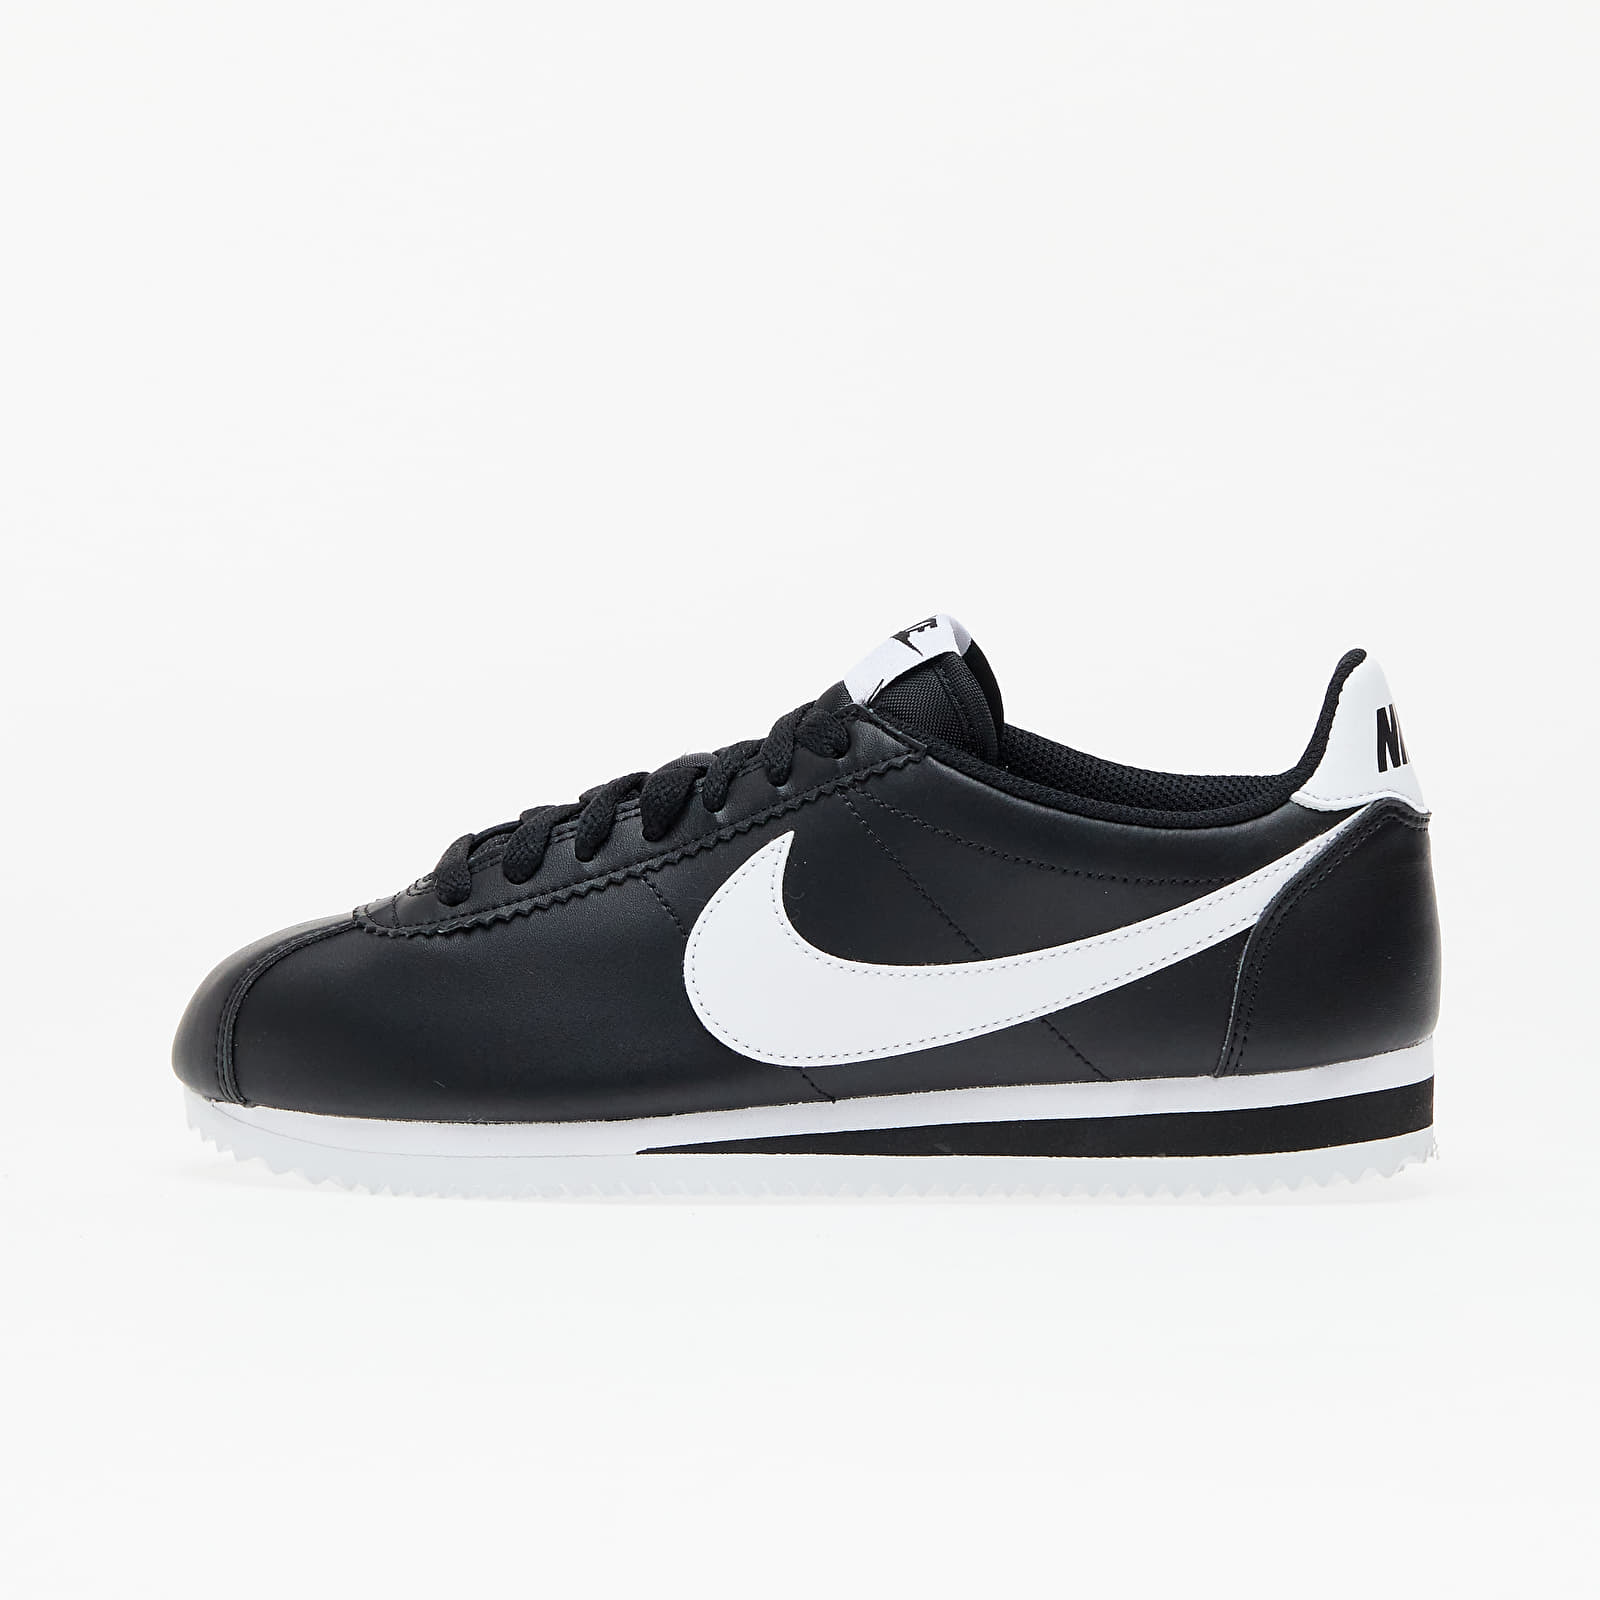 Women's shoes Nike Wmns Classic Cortez Leather Black/ White-White